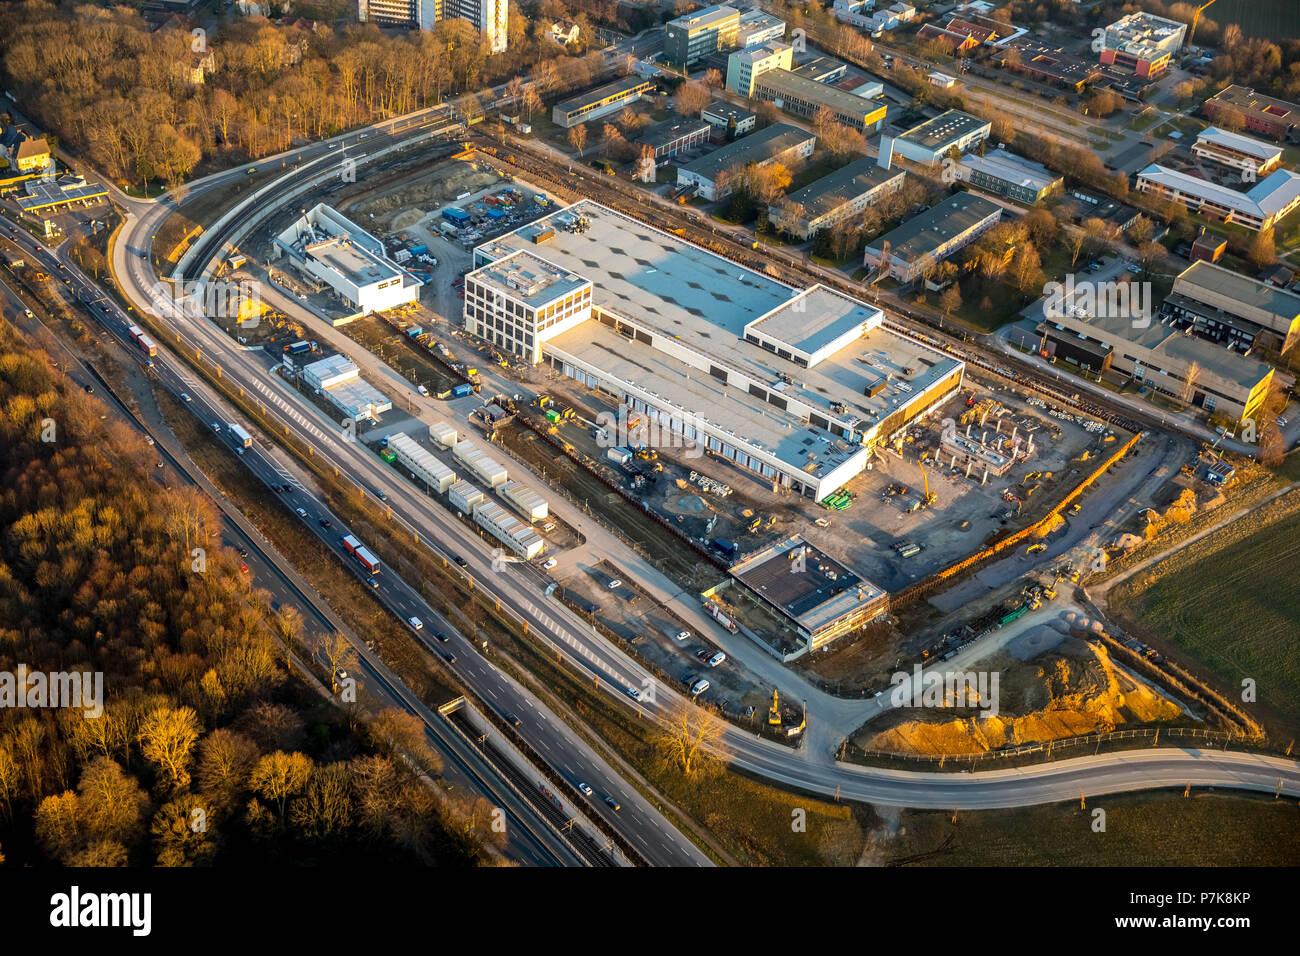 On the old barracks area in Dortmund, the Deutsche Bundesbank builing the largest money storage in Germany Fort Knox in Dortmund, Ruhrgebiet, North Rhine-Westphalia, Germany, - Stock Image